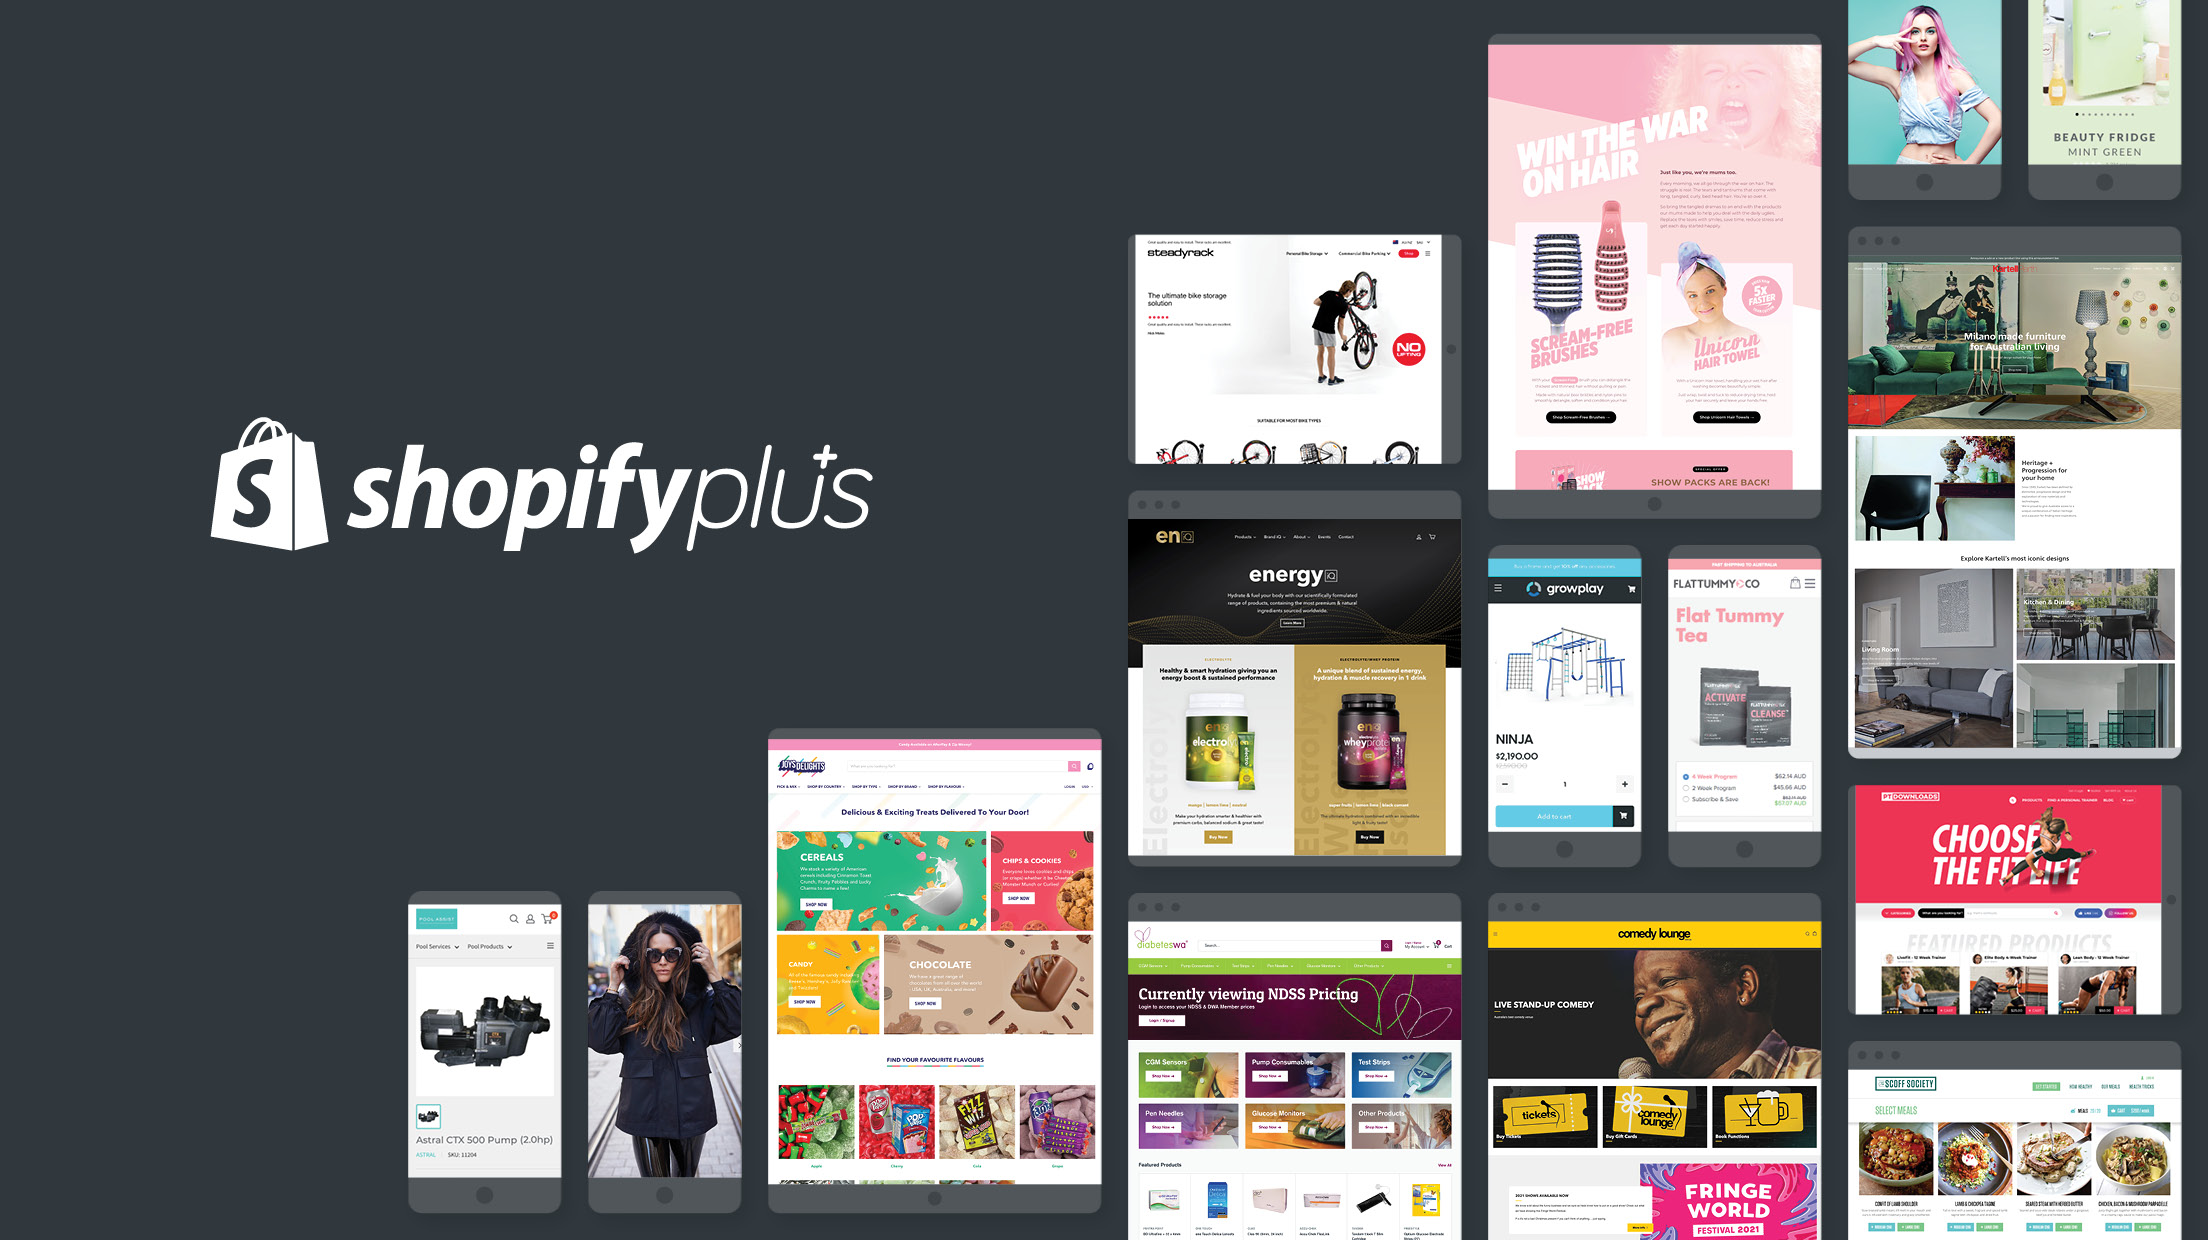 TheCut-2021-Facebook-Background-ShopifyPlus-v1